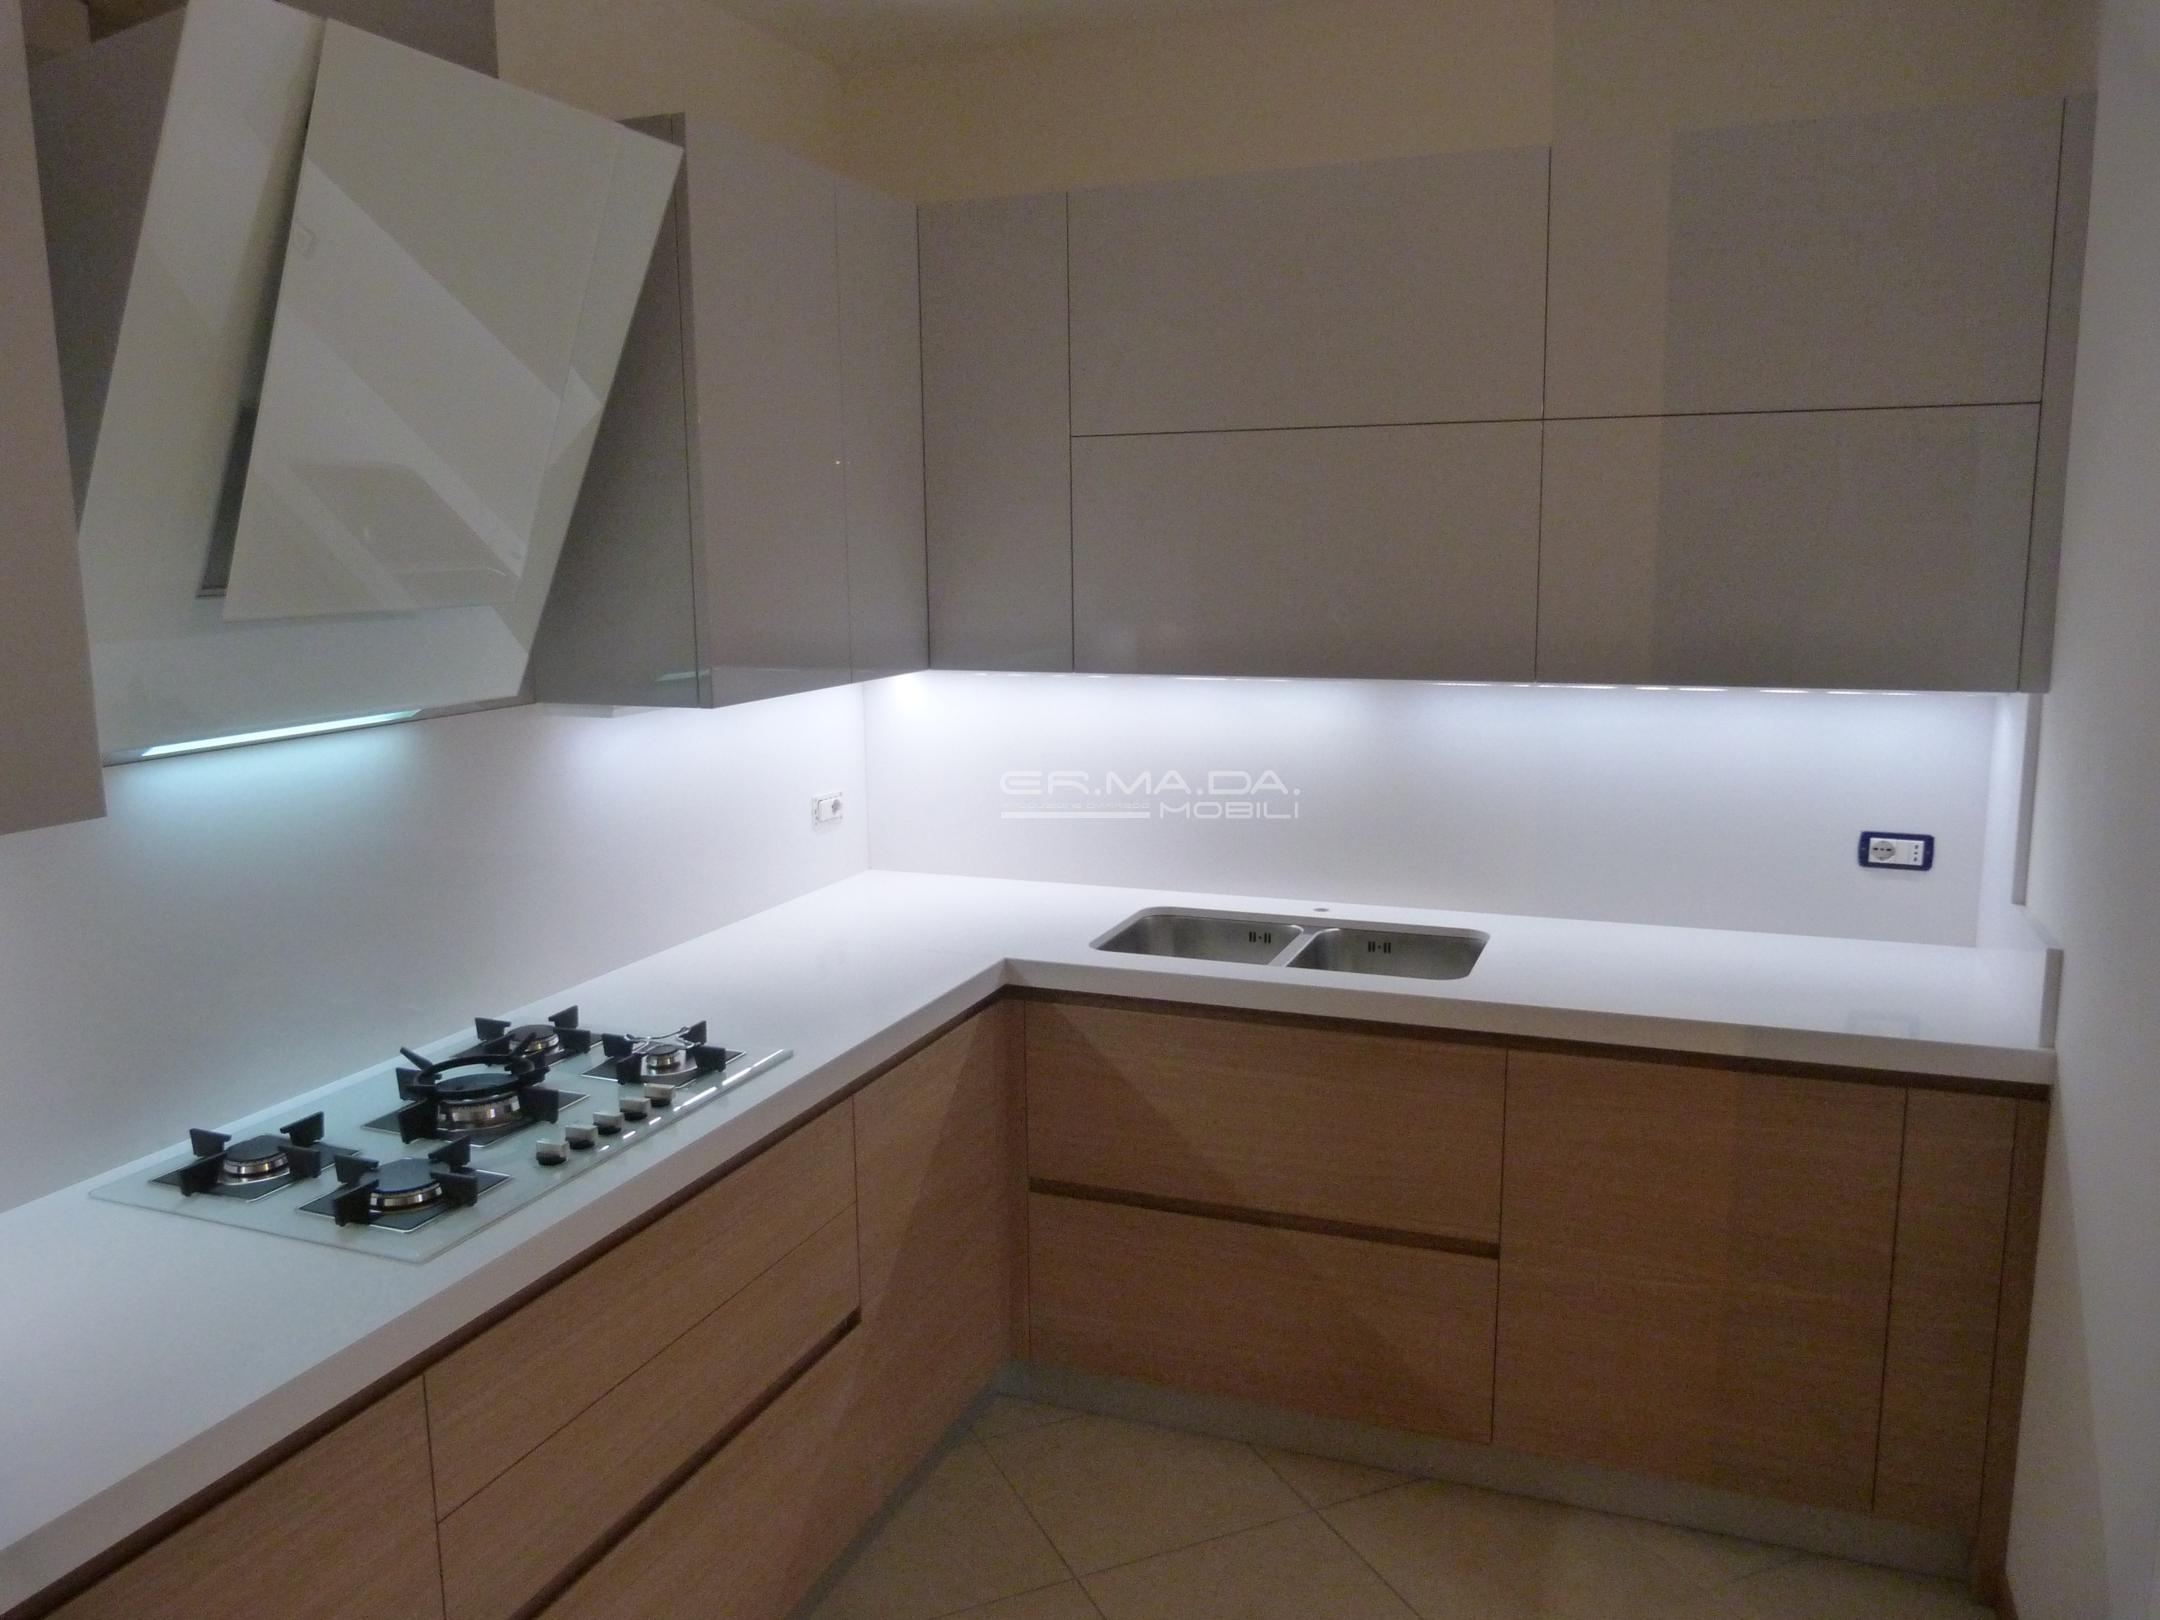 1 cucina moderna rovere e grigio lucido er ma da - Cucine bicolore moderne ...